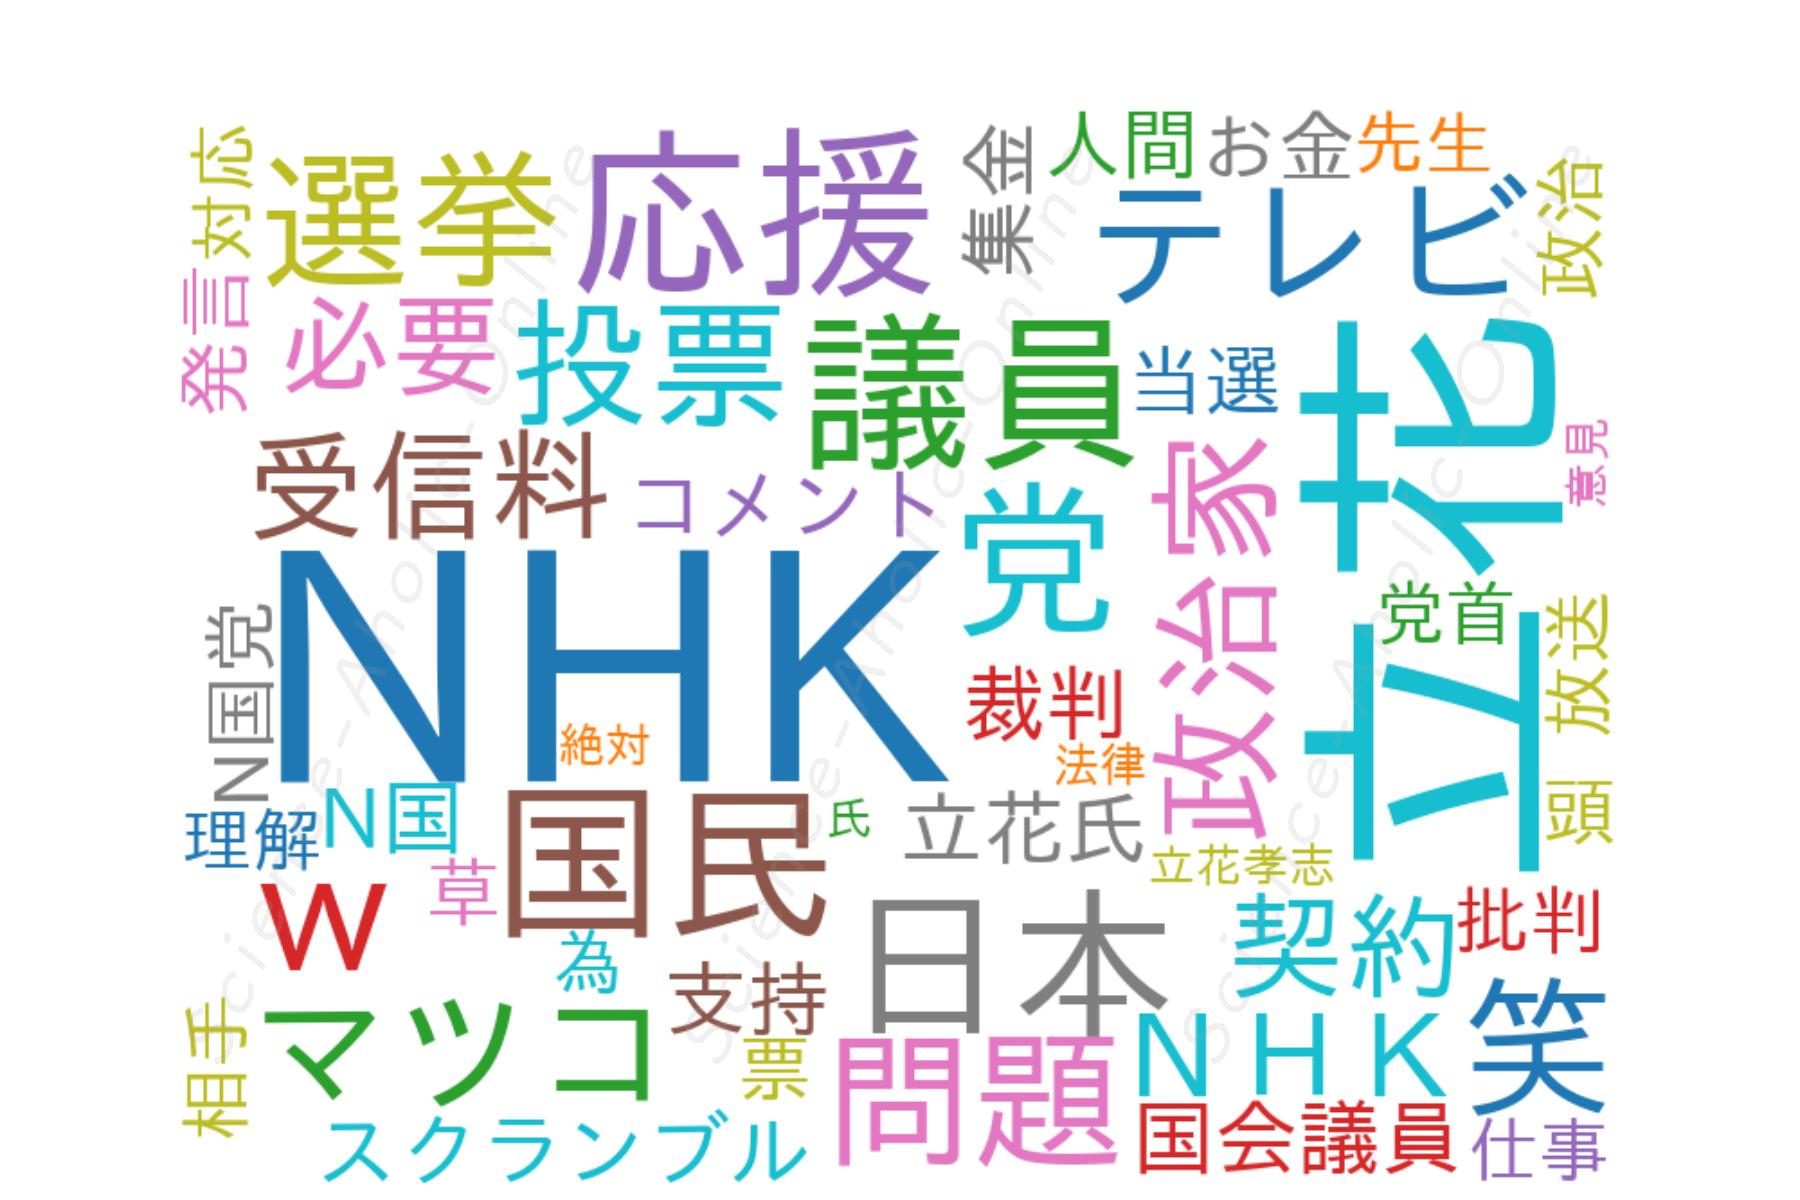 https://science-aholic-online.com/wp-content/uploads/2020/08/wordcloud_立花孝志.png